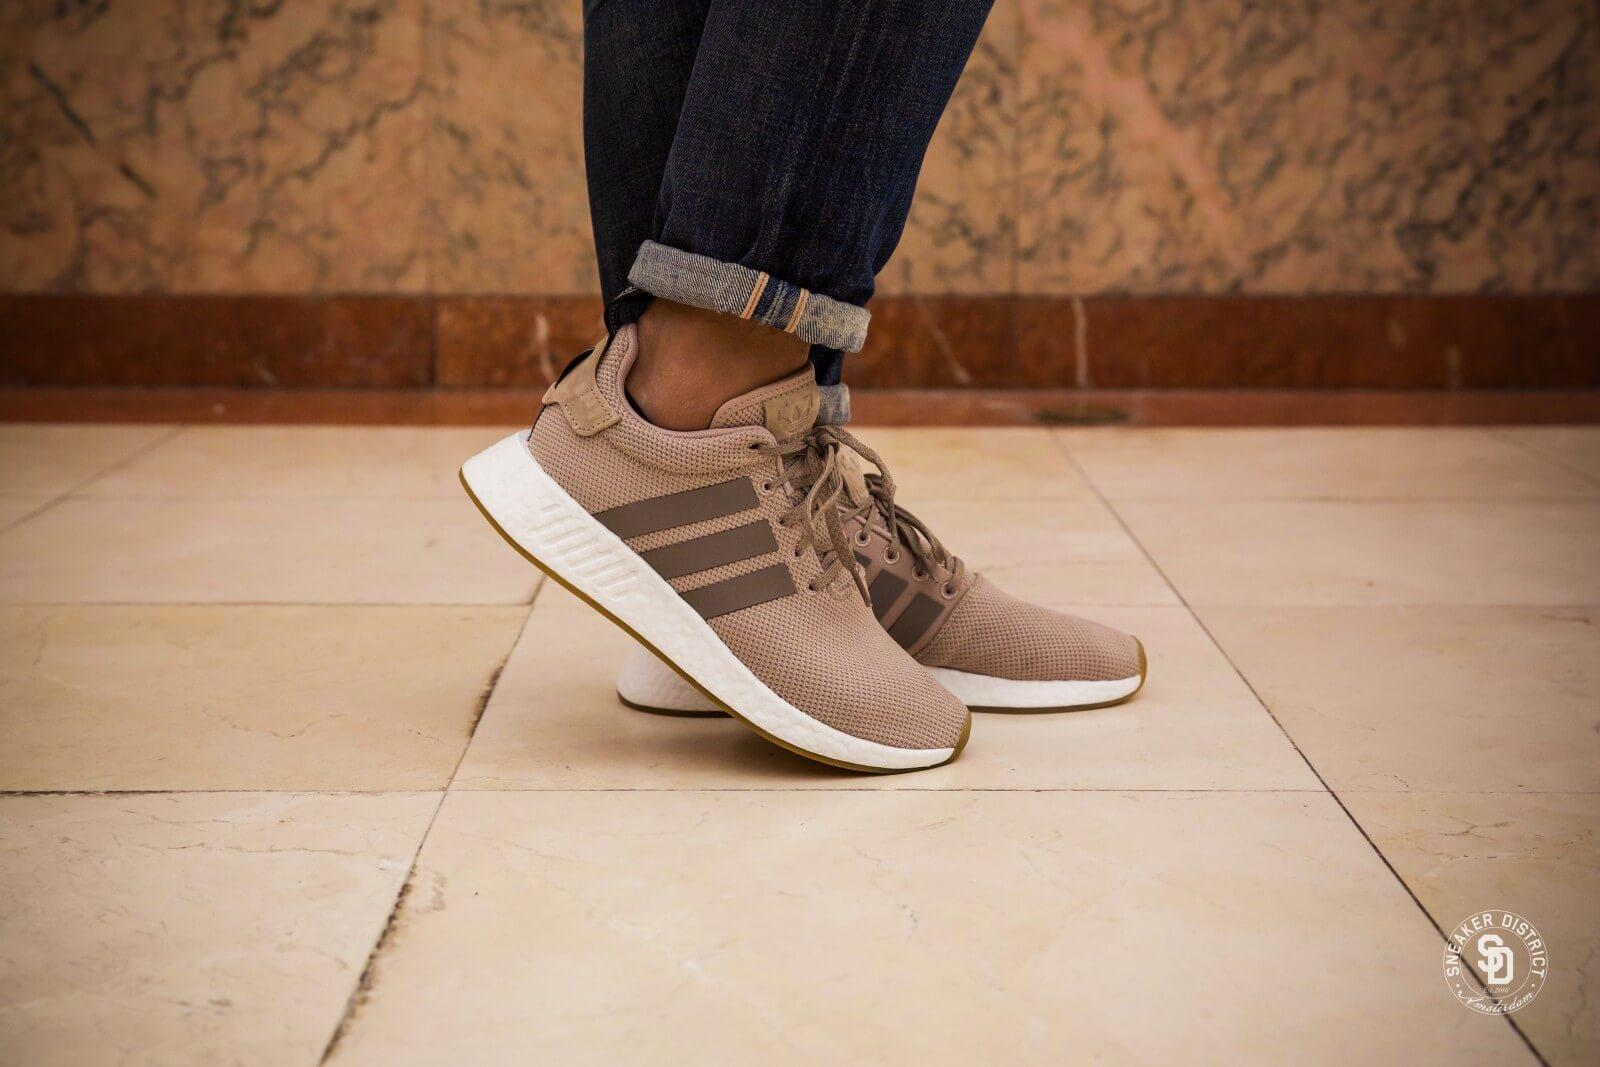 Adidas NMD R2 Beige/Trace Khaki/Simple